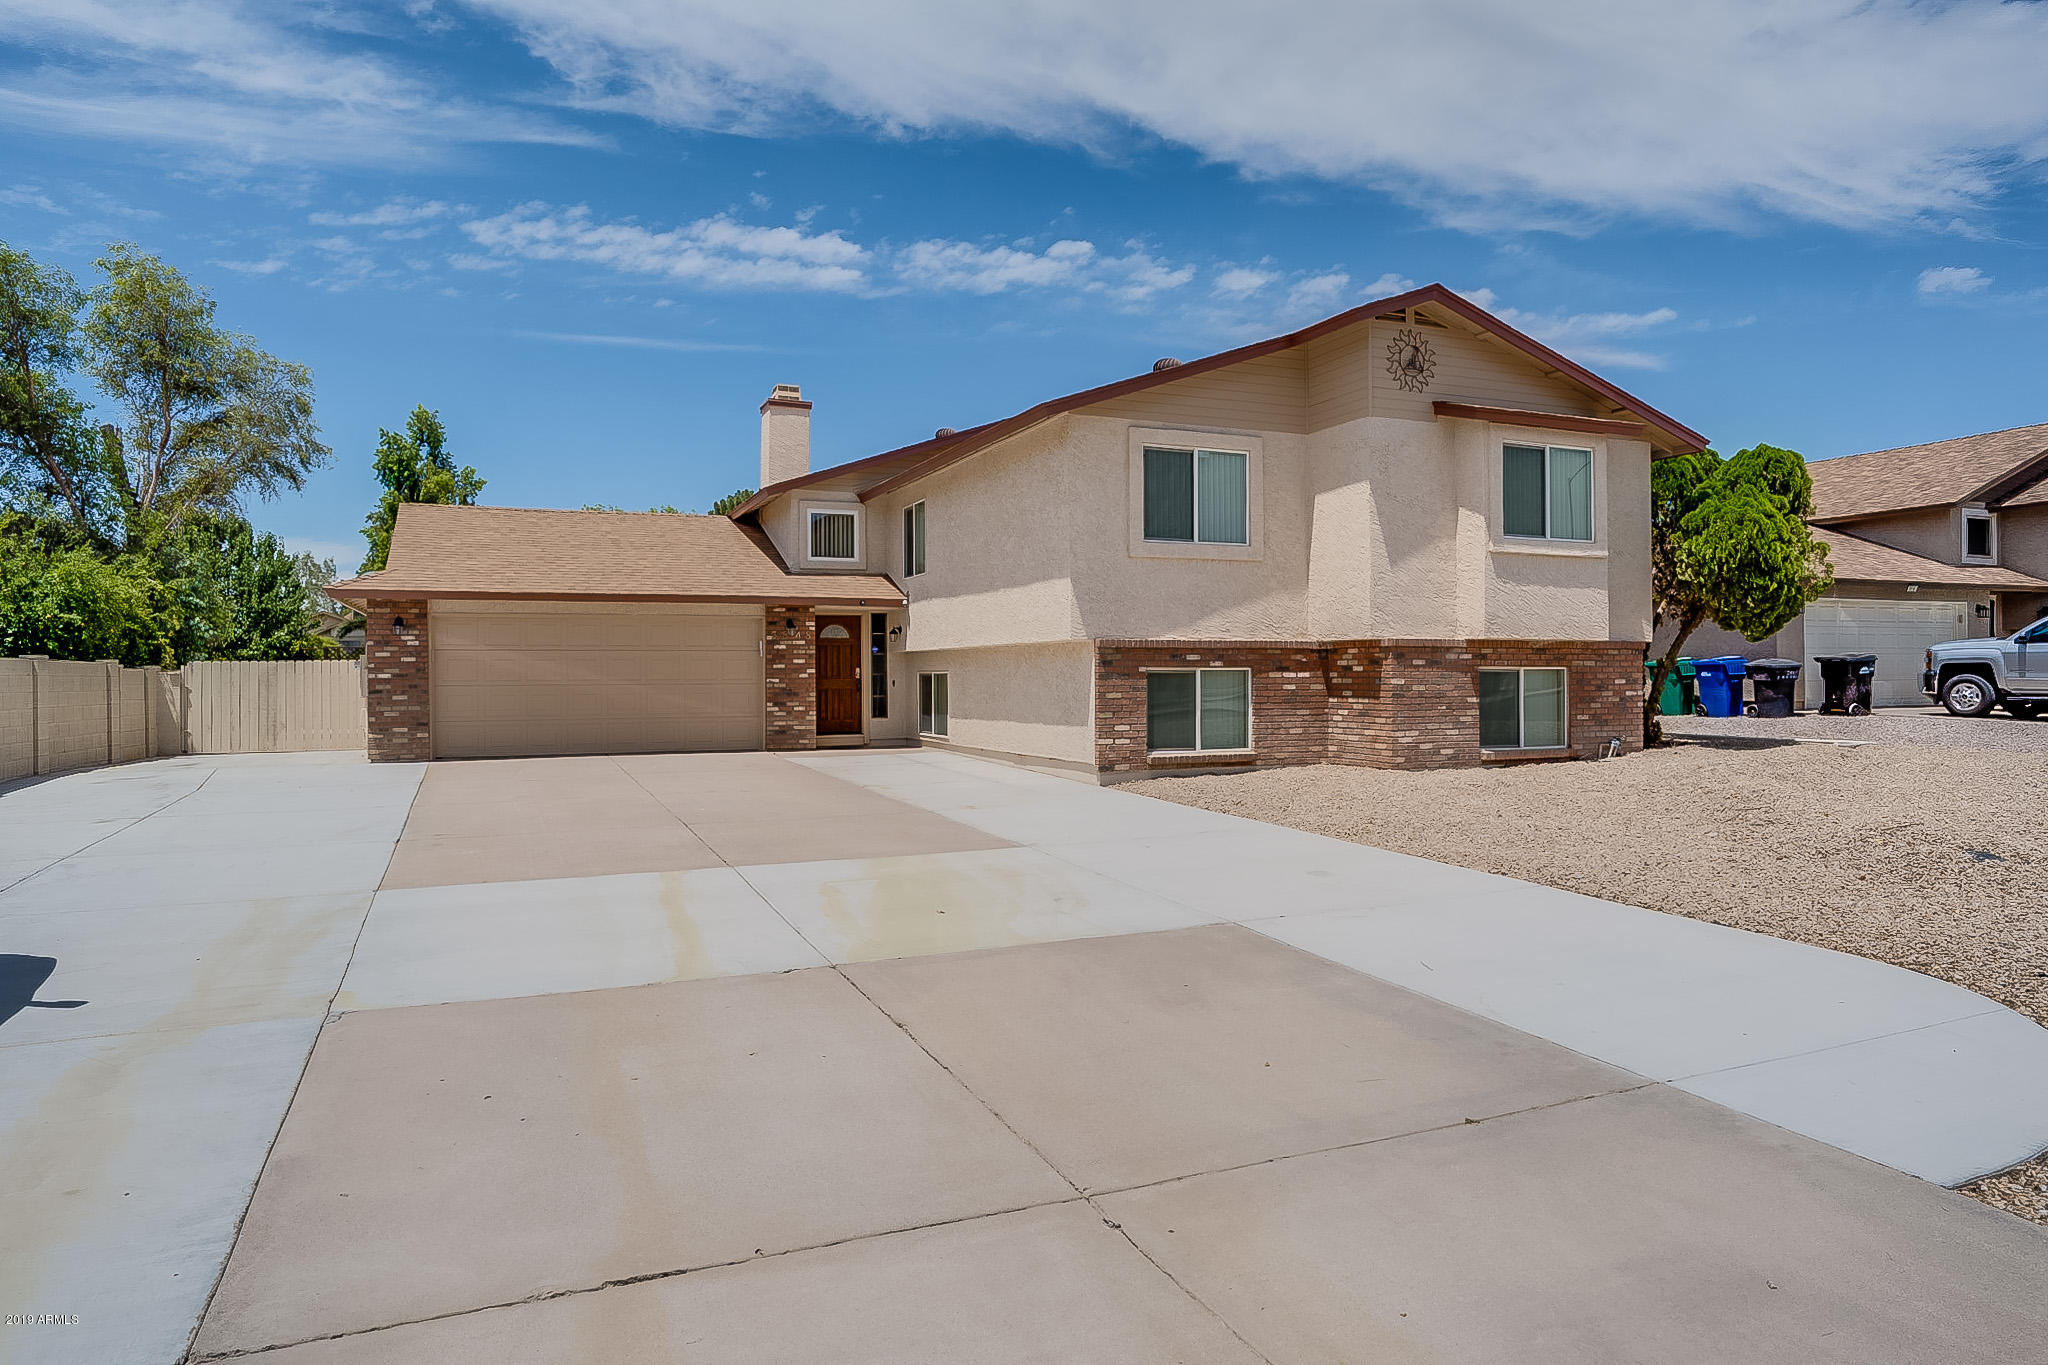 Photo of 3848 E PUEBLO Avenue, Mesa, AZ 85206